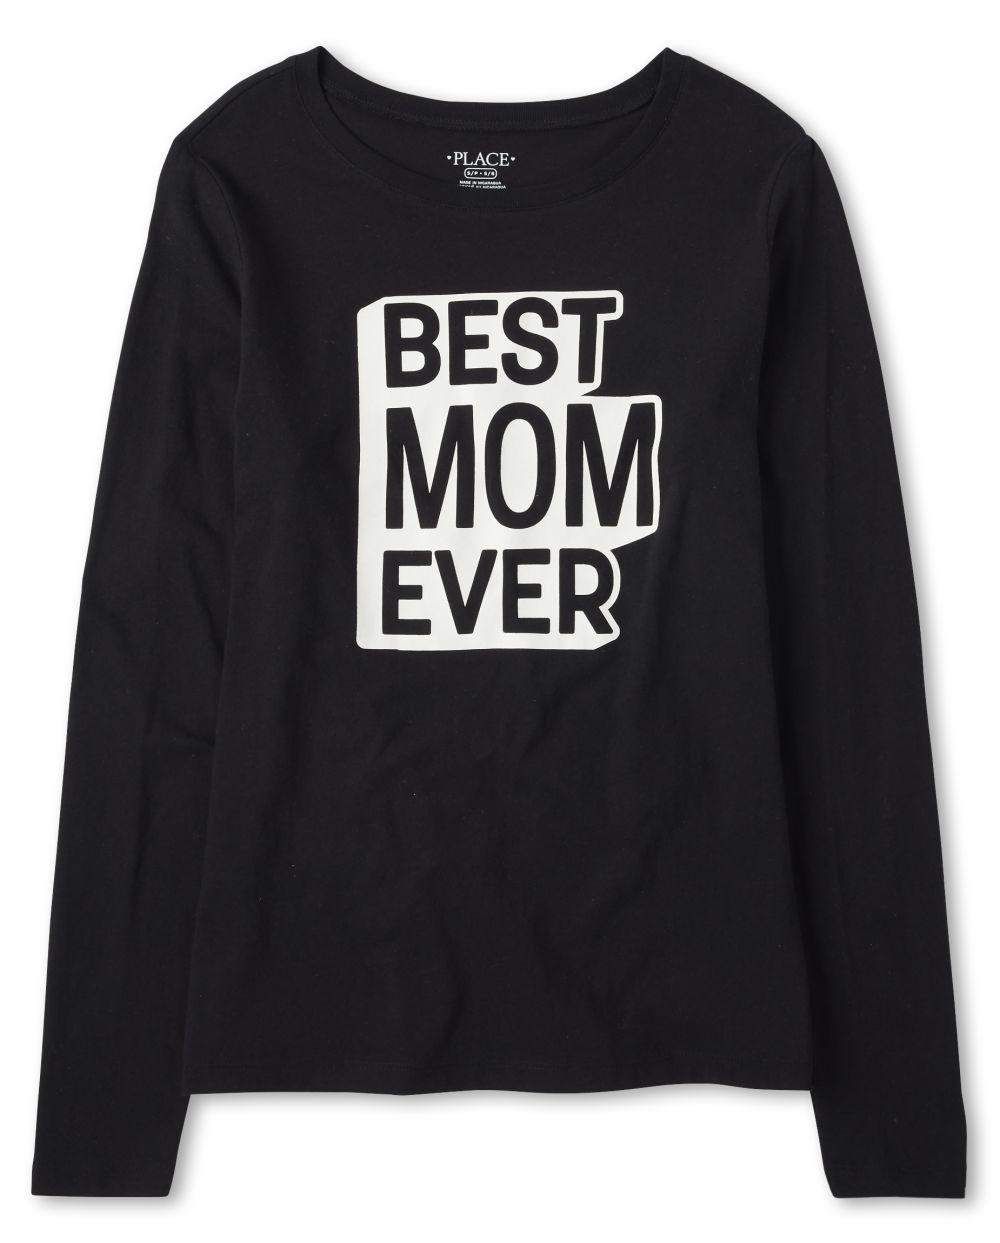 Womens Matching Family Mom Graphic Tee - Black T-Shirt